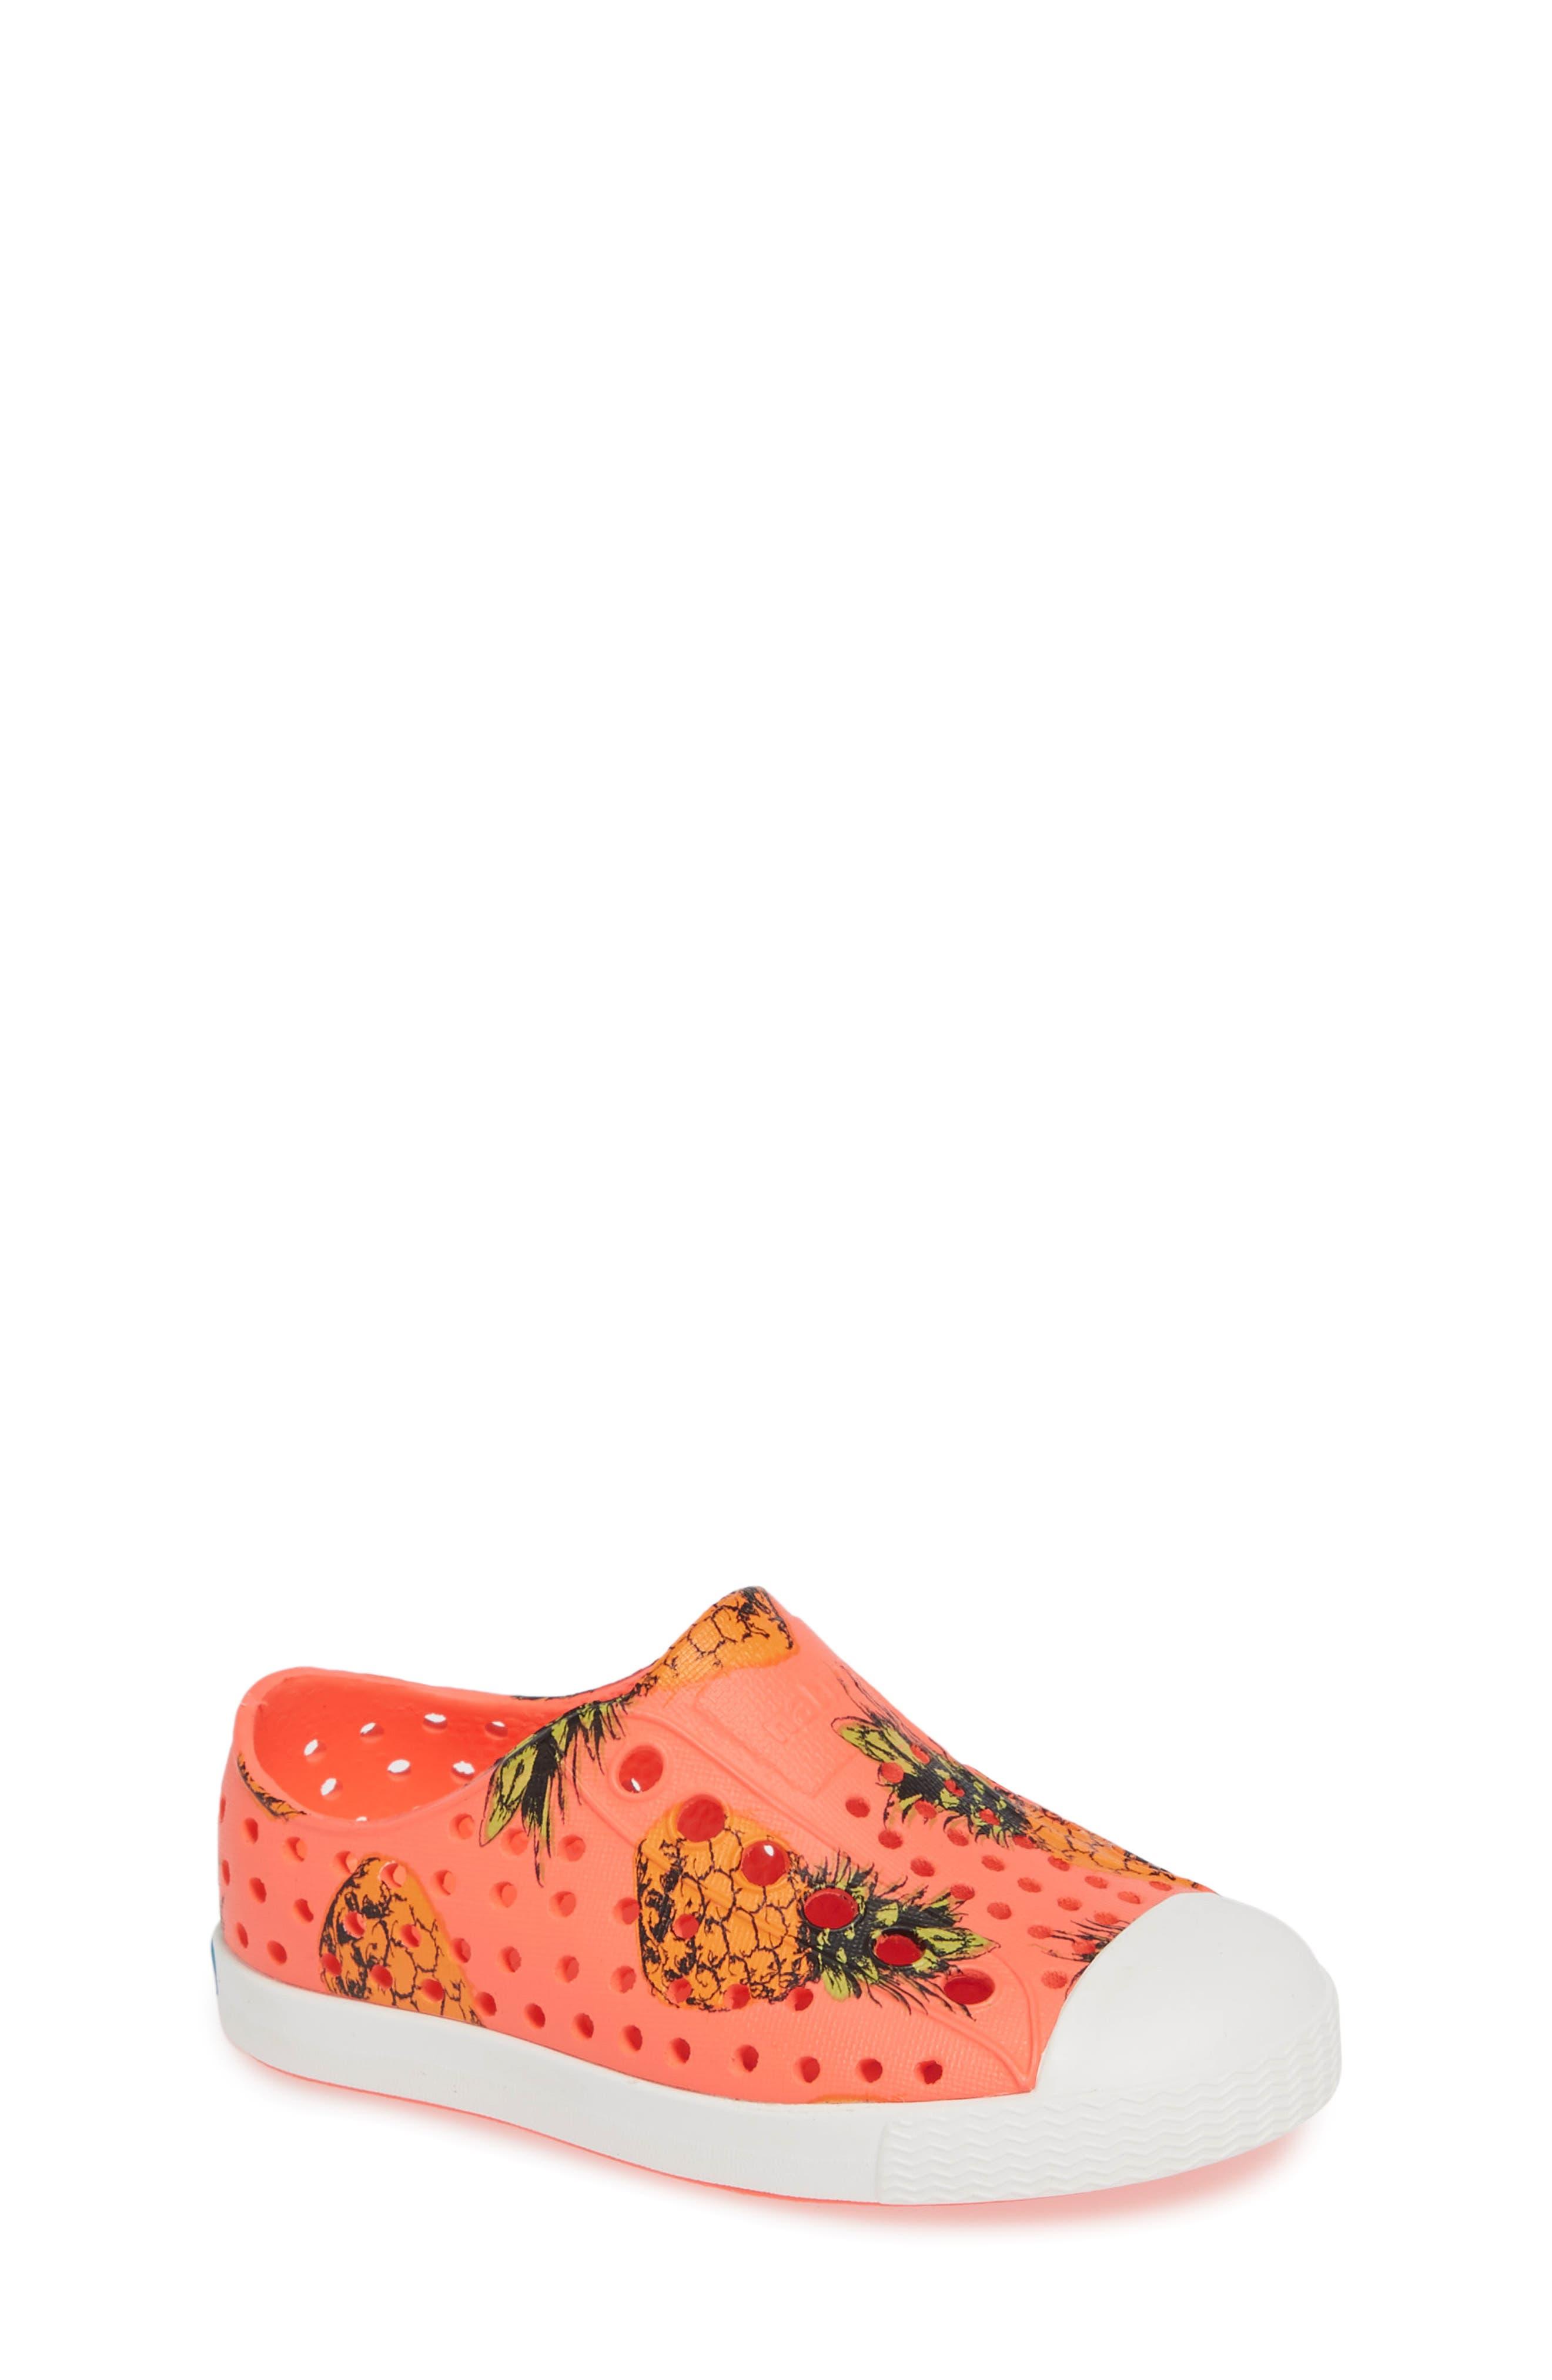 Jefferson Pineapple Print Water Friendly Sneaker,                             Main thumbnail 1, color,                             POPSTAR PINK/ WHITE PINEAPPLES